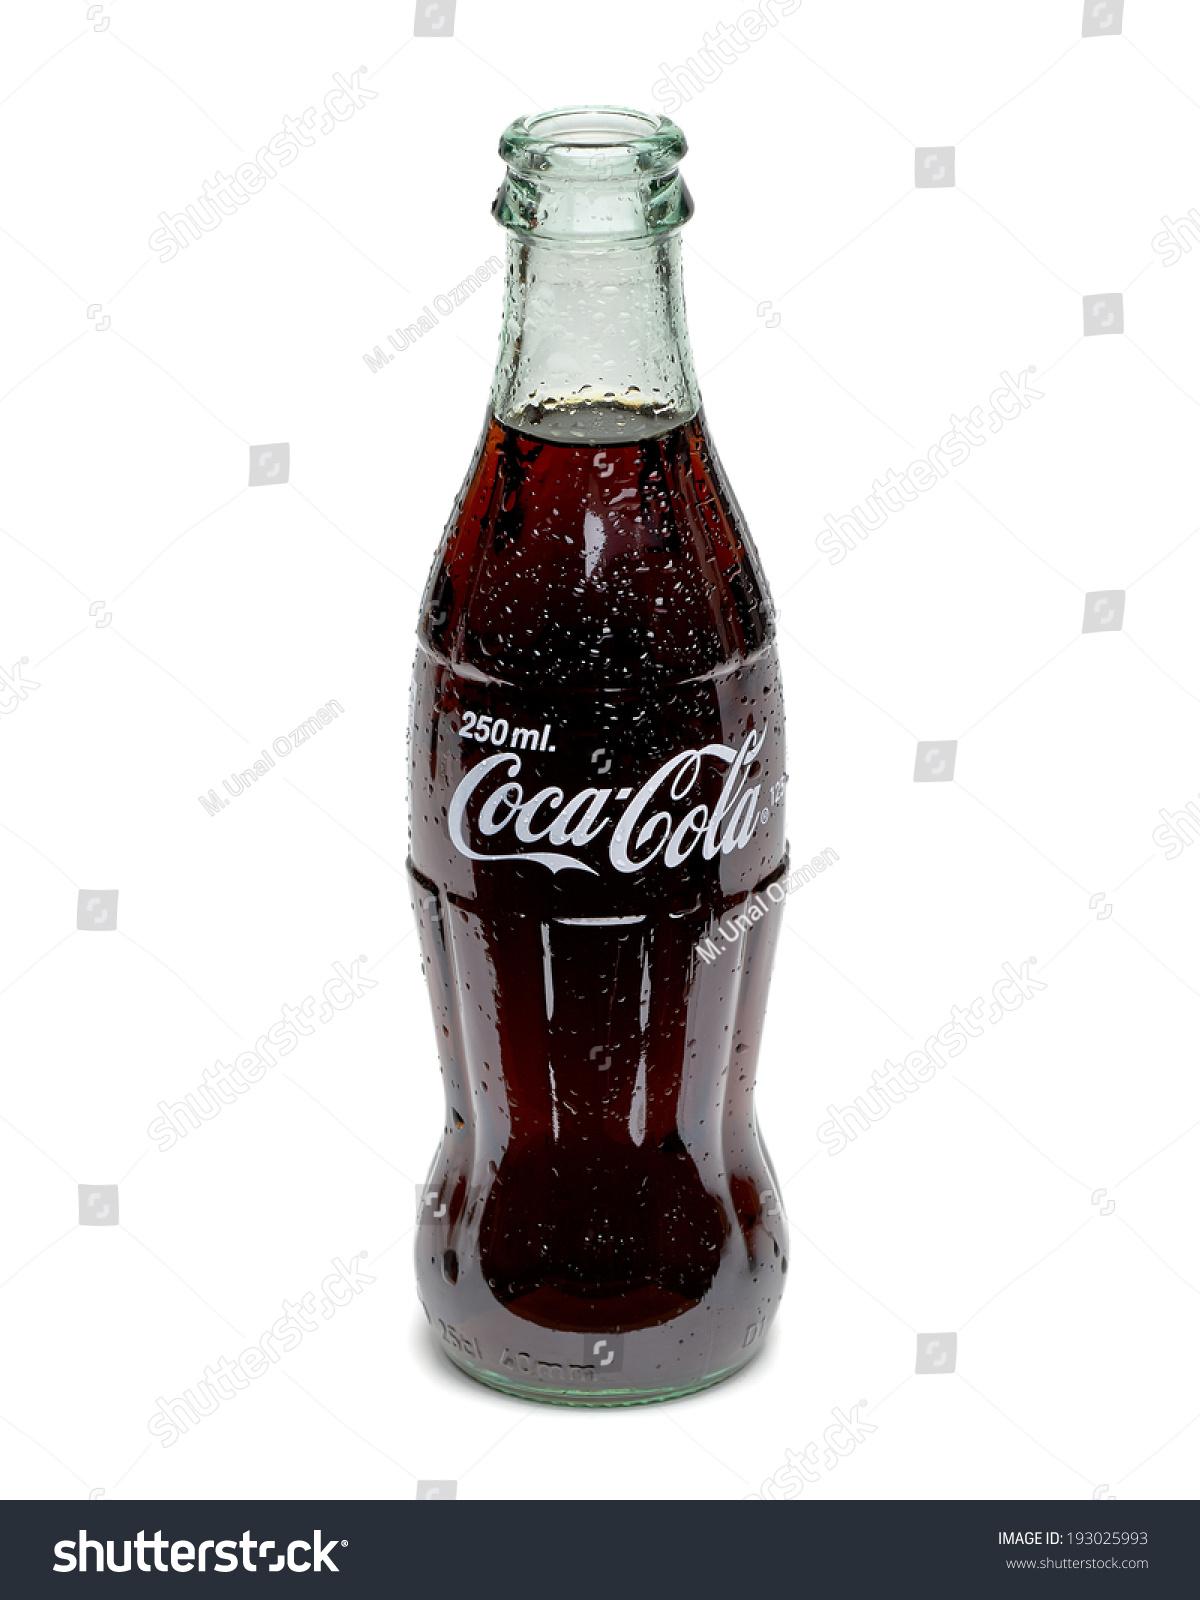 Coca-Cola: FAST Fundamental Analysis